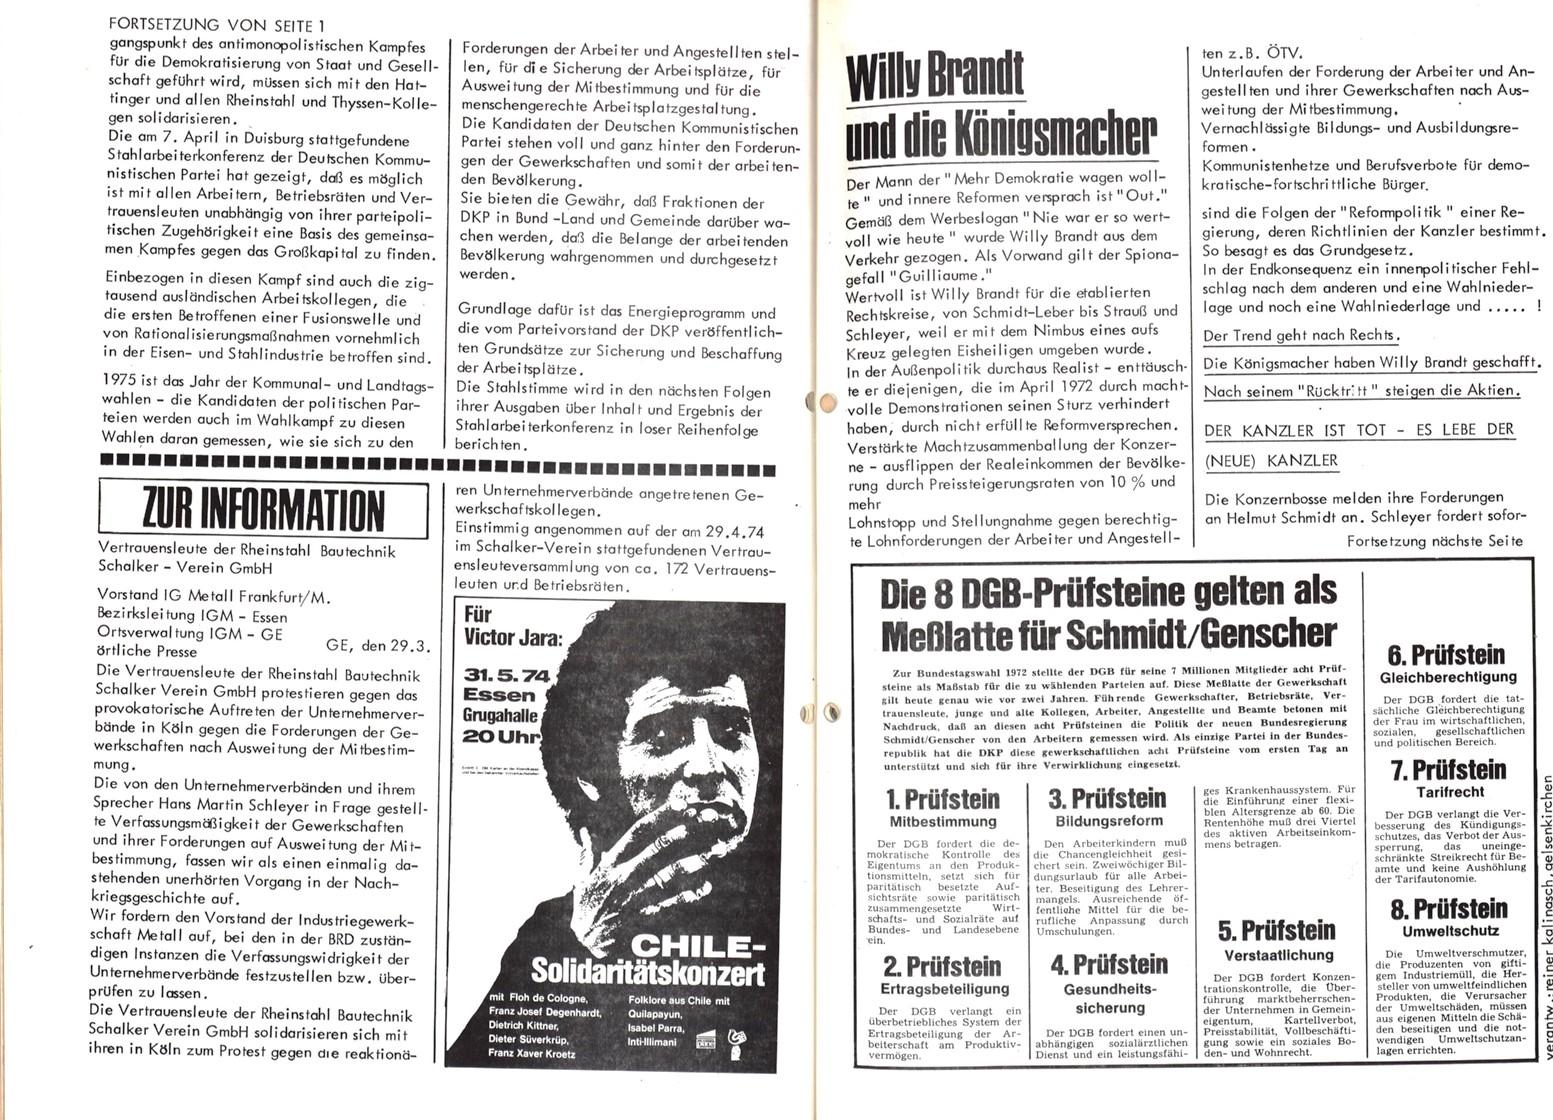 GE_DKP_Stahlstimme_19740500_02